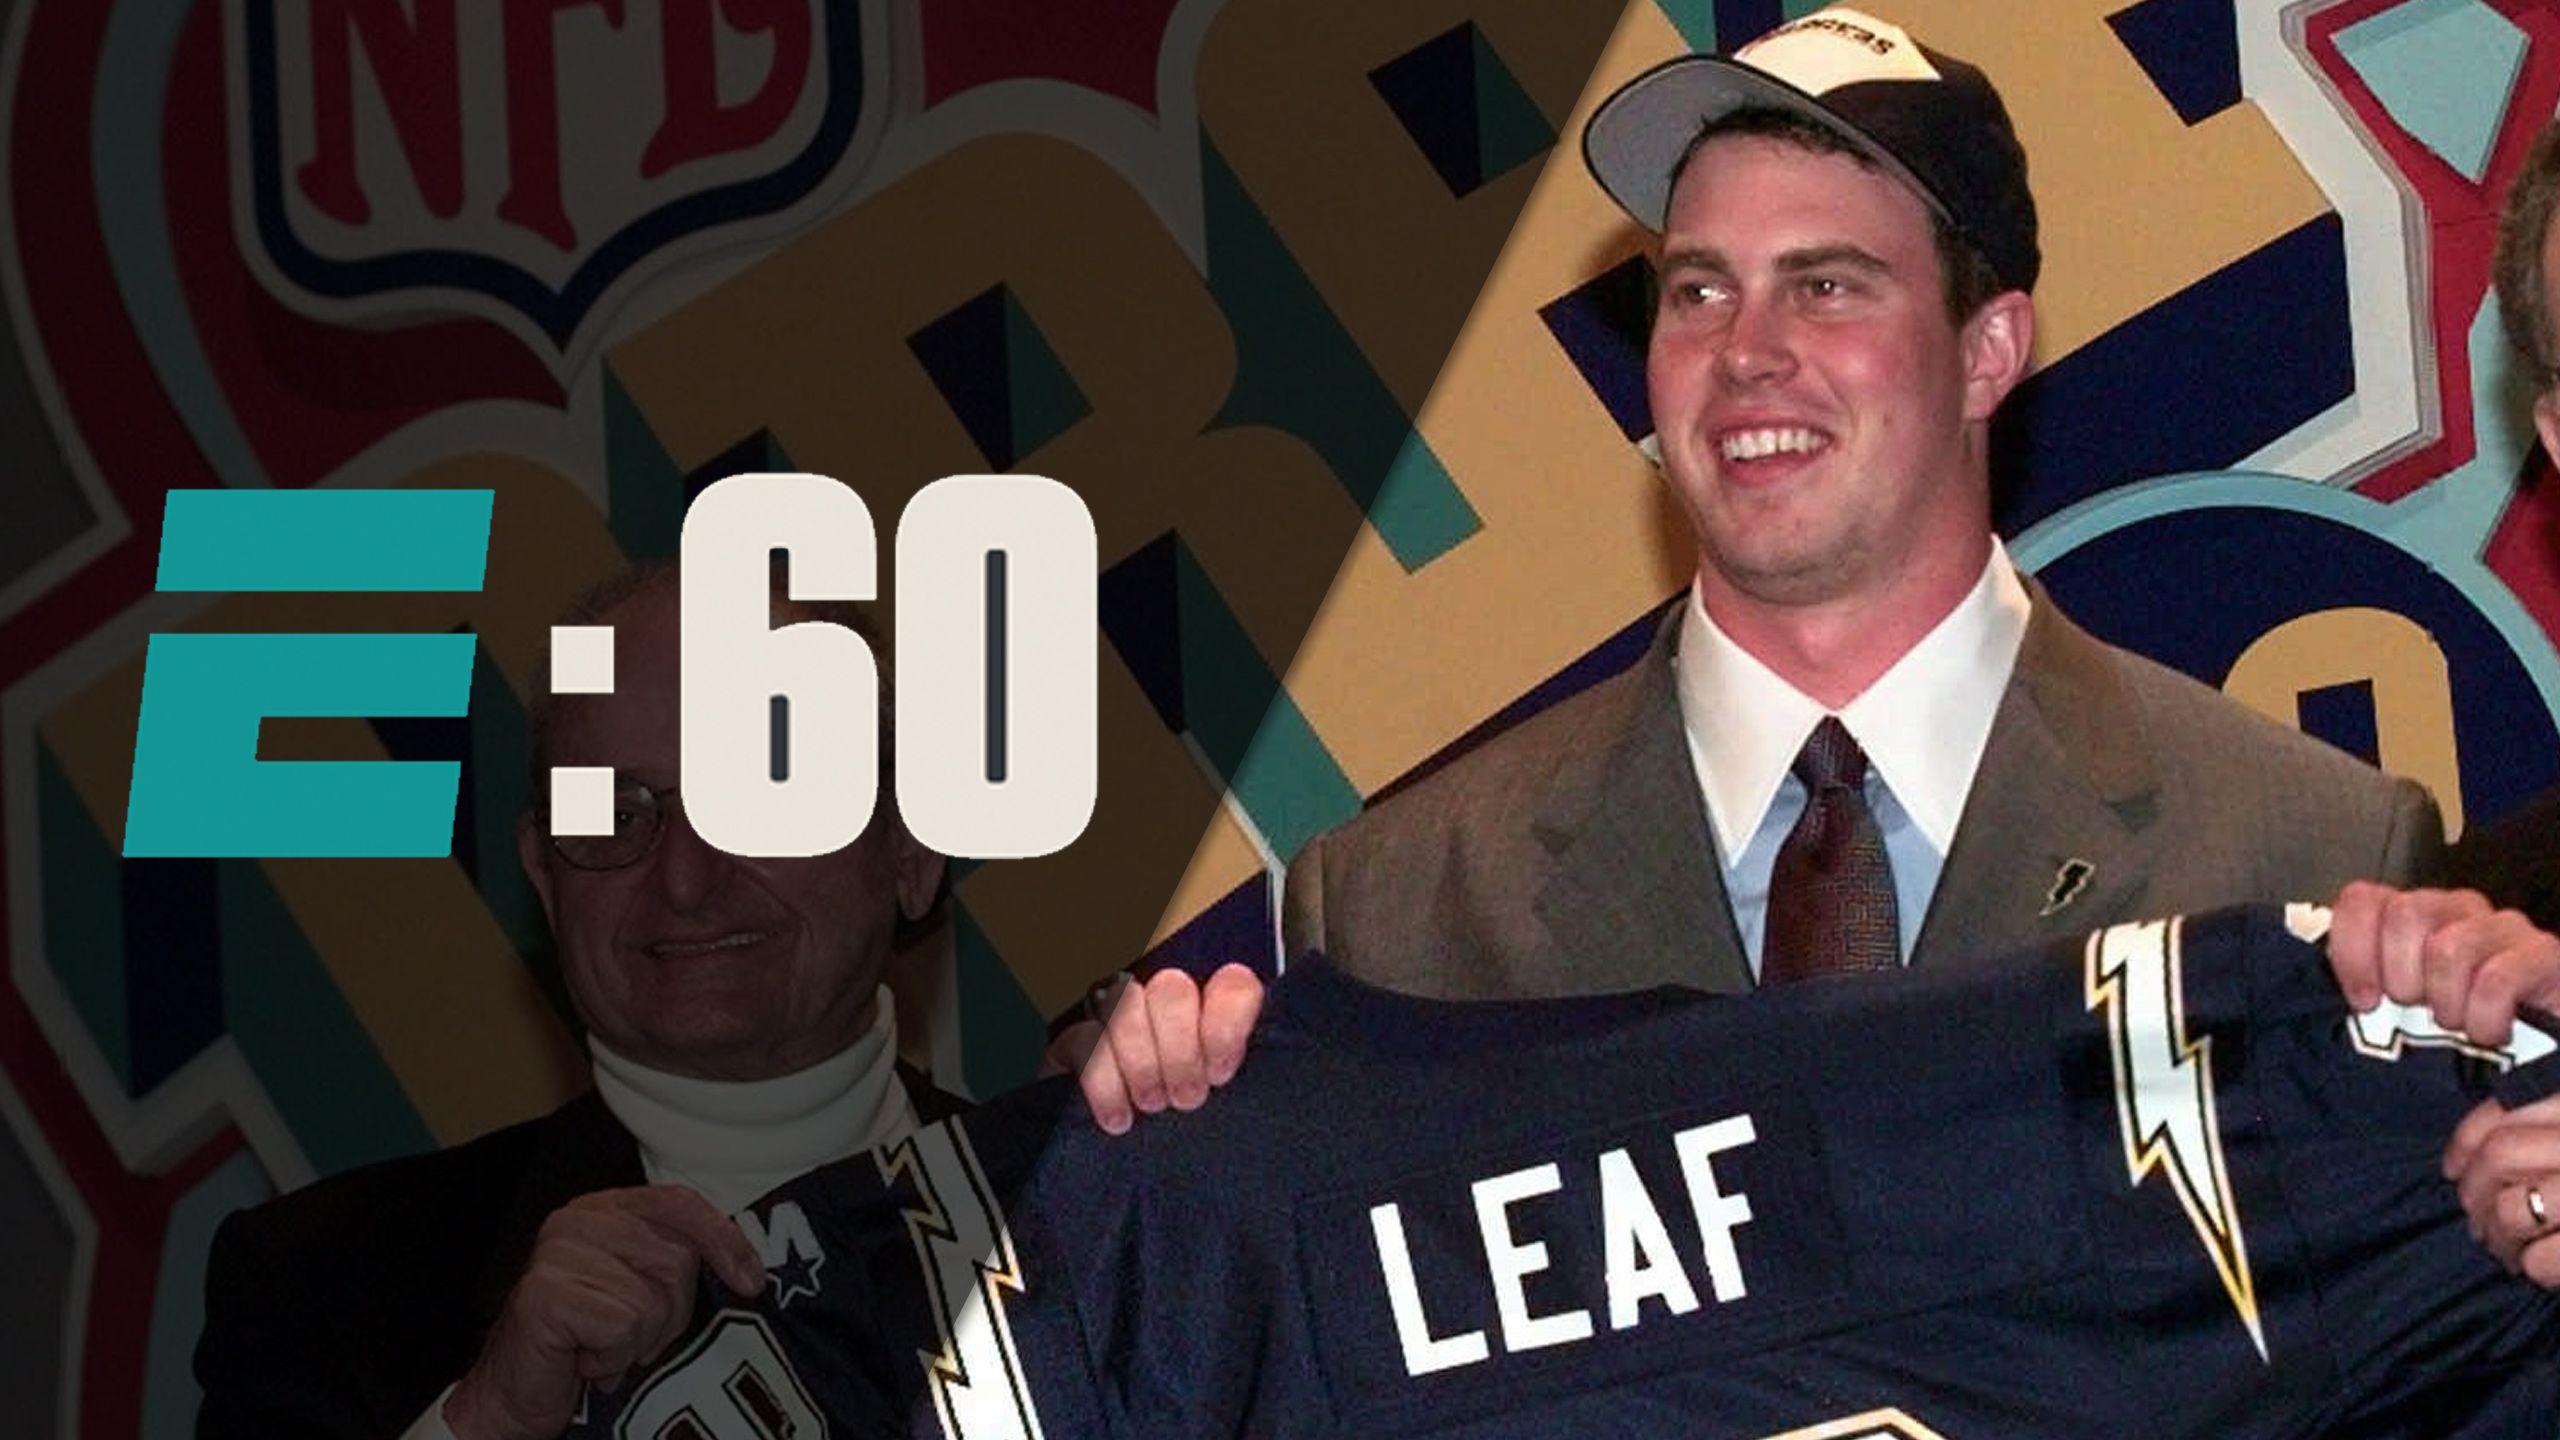 E:60 - Ryan Leaf Presented by Liberty Mutual